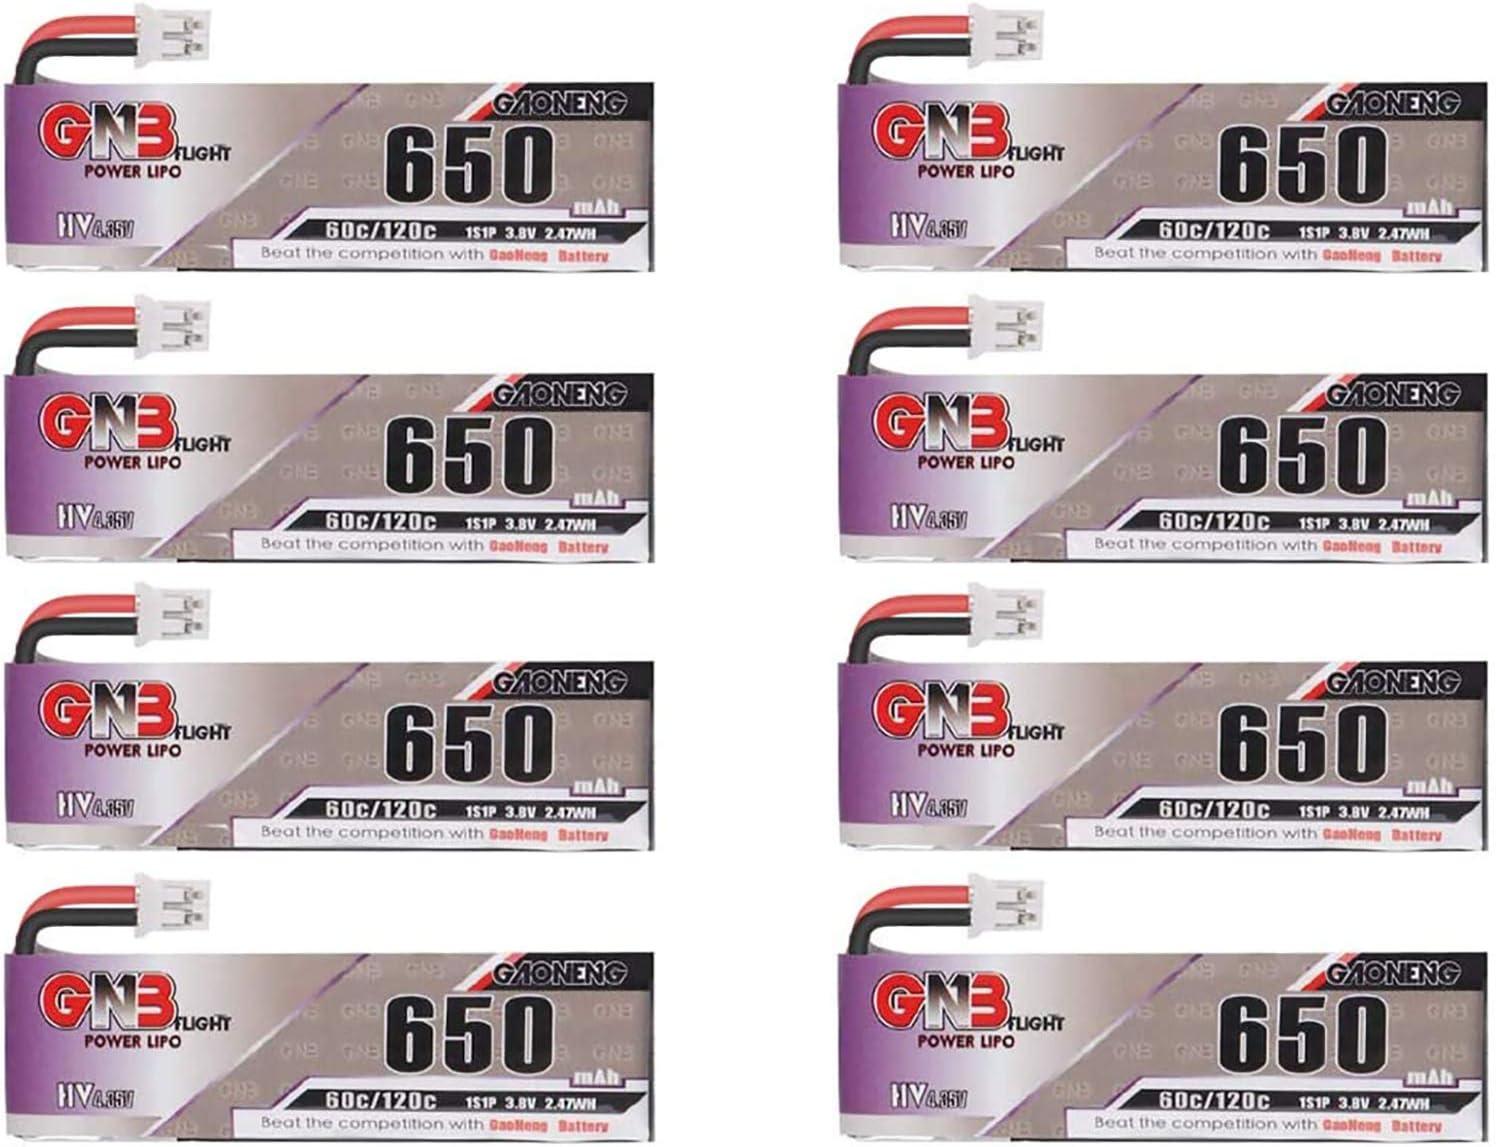 8PCS Gaoneng 650mAh 1S LiPo Battery Chicago Mall HV 3.8V JST-PH 2.0 Free Shipping Cheap Bargain Gift 60C with